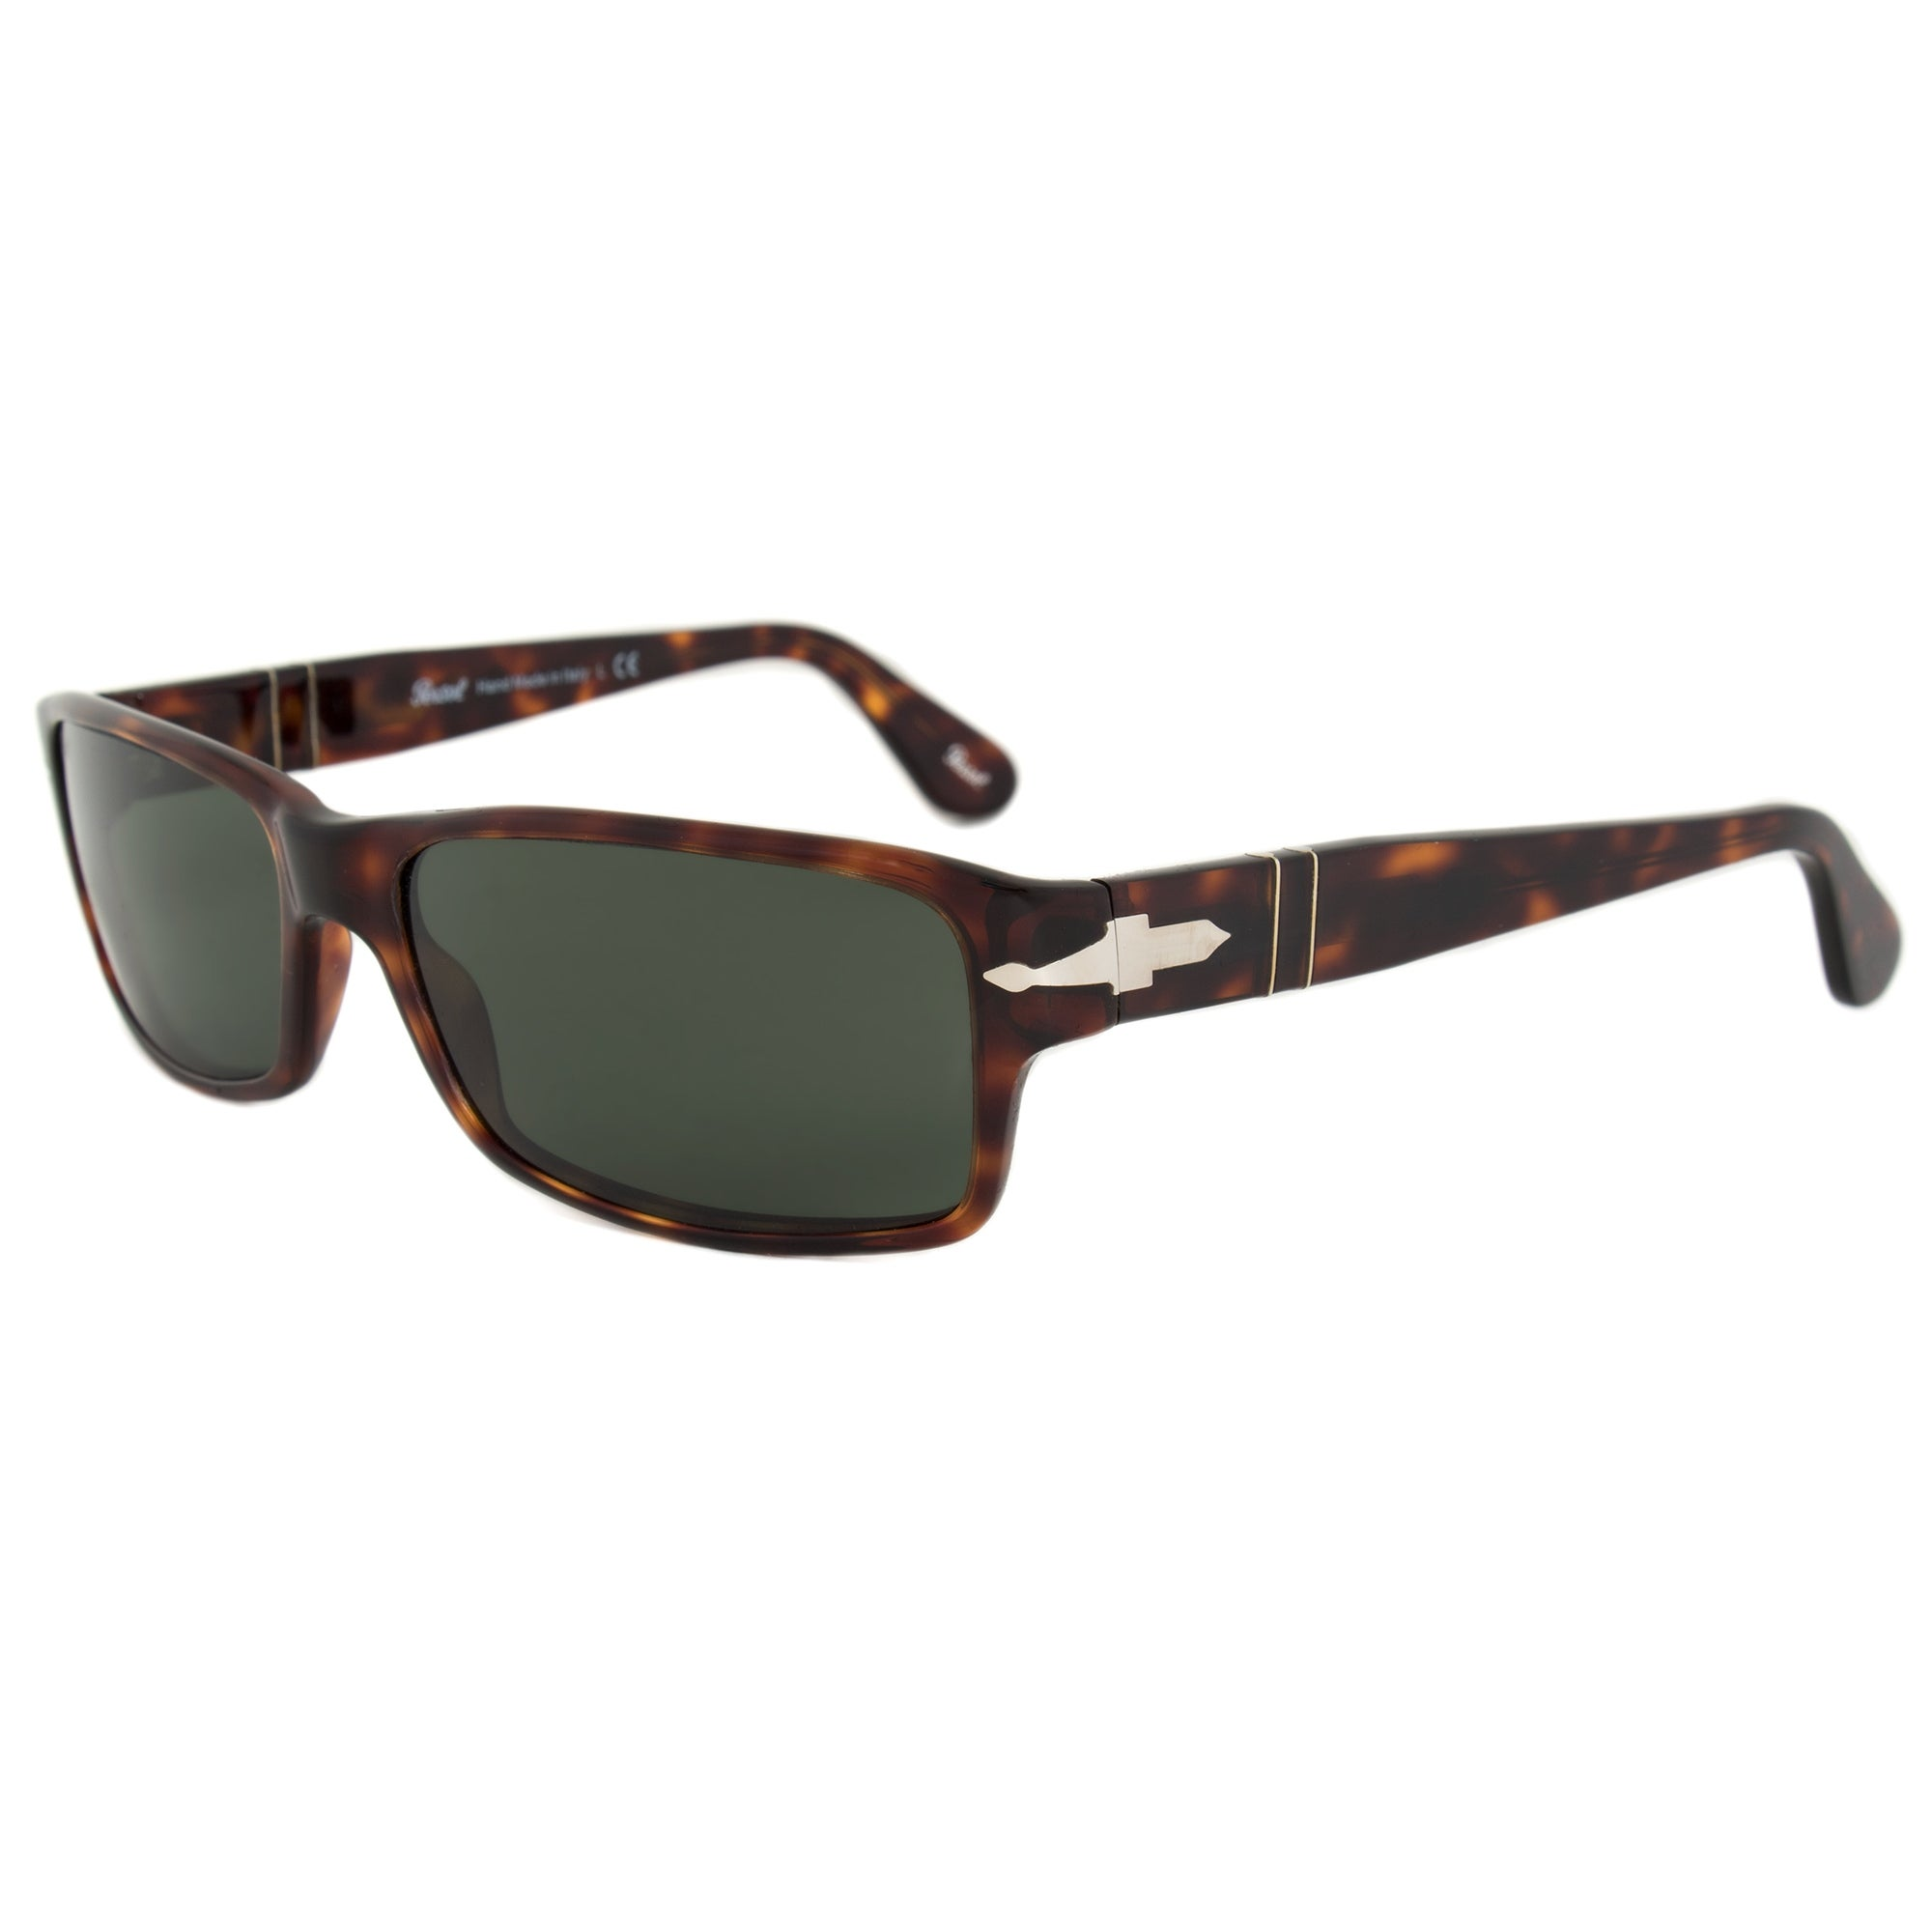 9e3e61e52a093 Shop Persol Rectangle Sunglasses PO2747S 24 31 57 - Free Shipping Today -  Overstock - 19622340